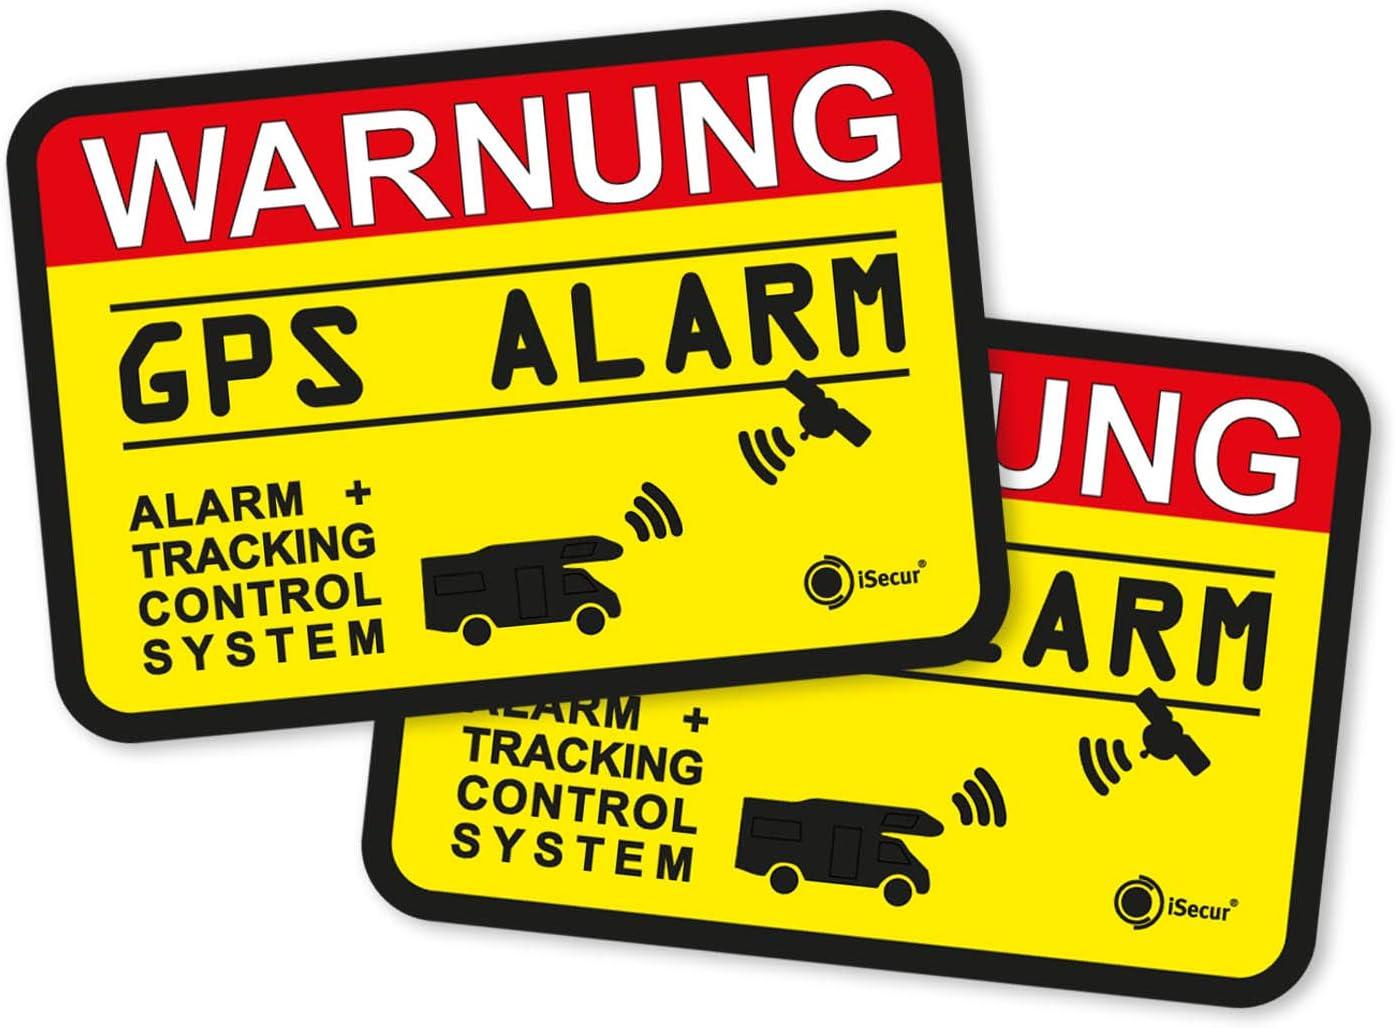 Isecur 2er Set Hinweis Aufkleber Gps Alarm Tracking System I 6 X 4 Cm Innenklebend I Achtung Warnung Gps Alarm Gesichert Wohnmobil Wohnwagen I Hin 438 Auto